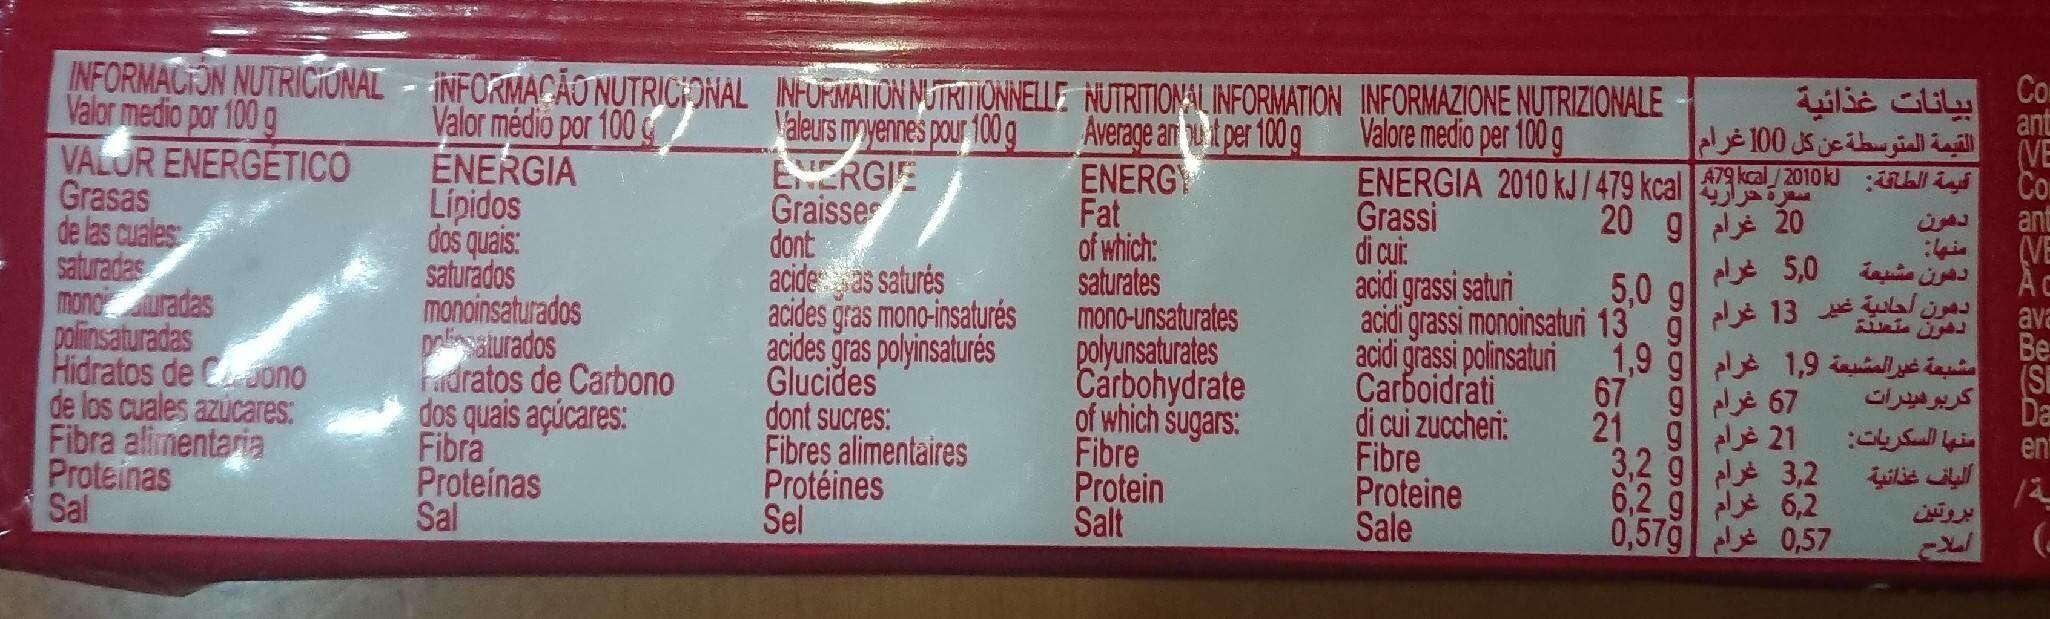 Cookies con chips de chocolate - Informations nutritionnelles - fr